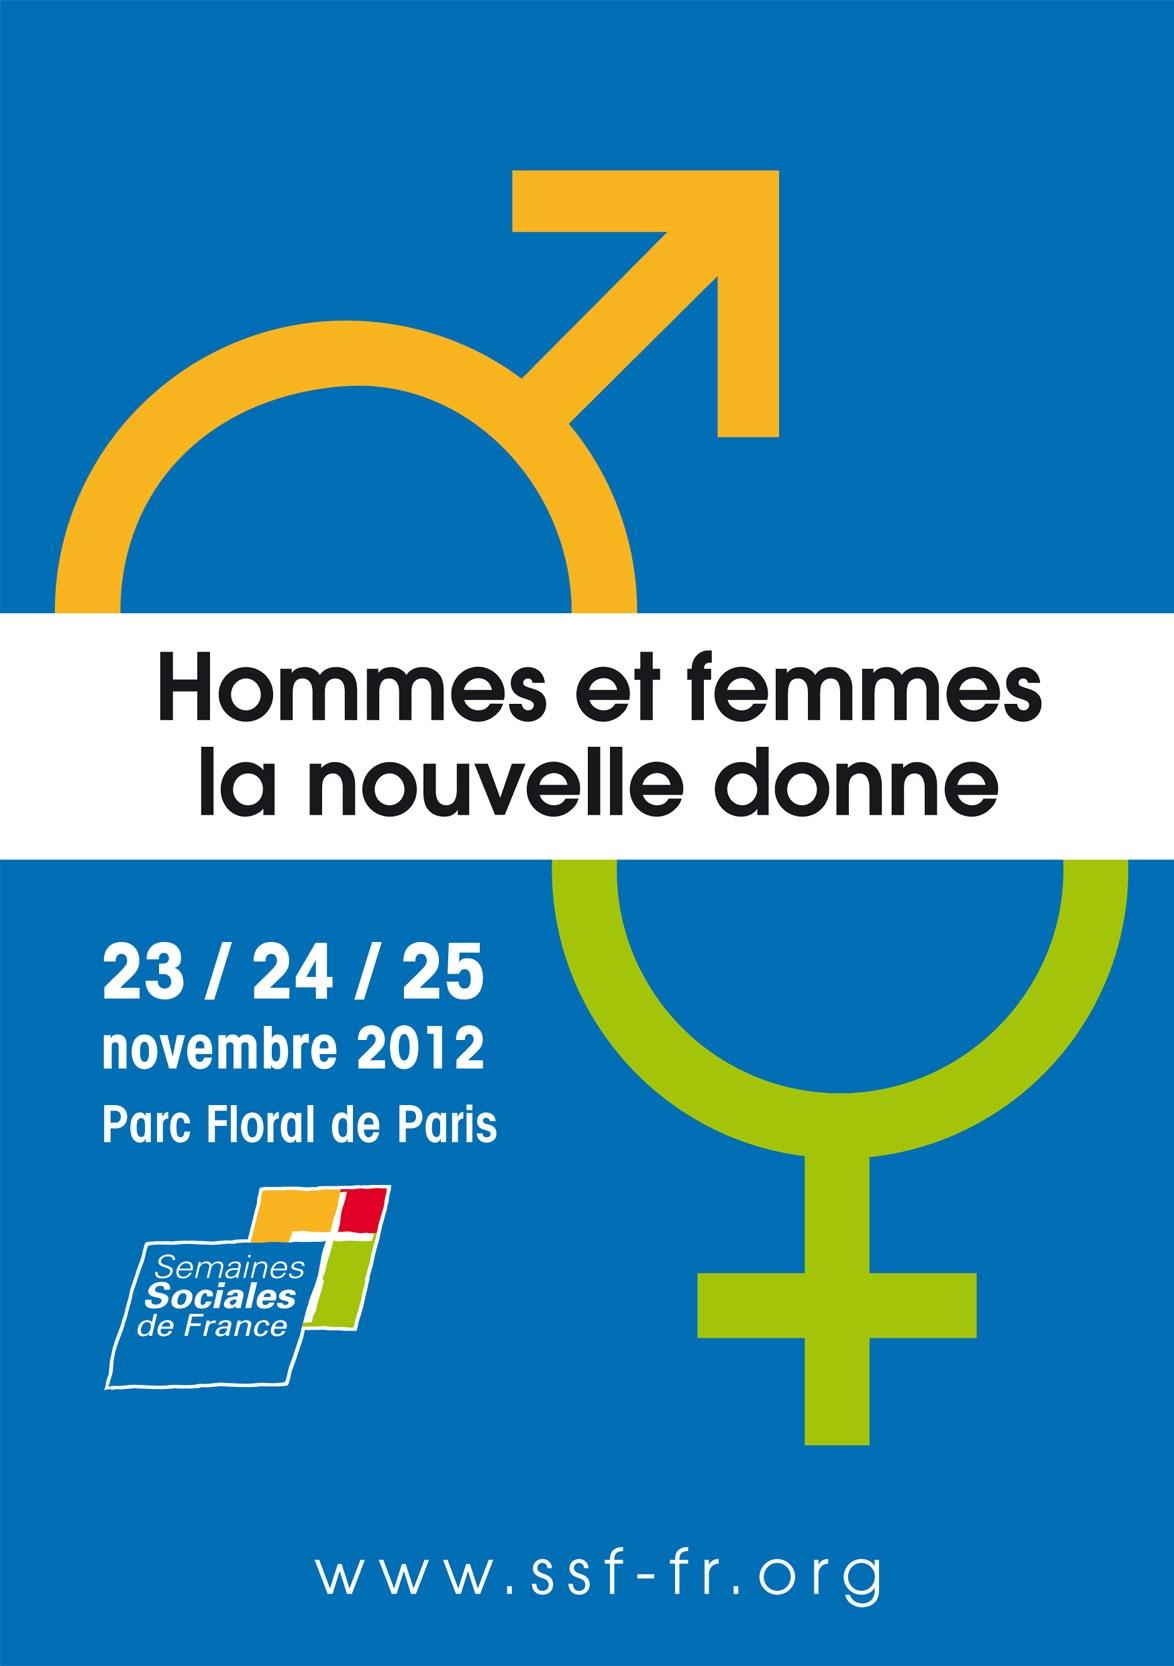 Semaines Sociales de France 2012